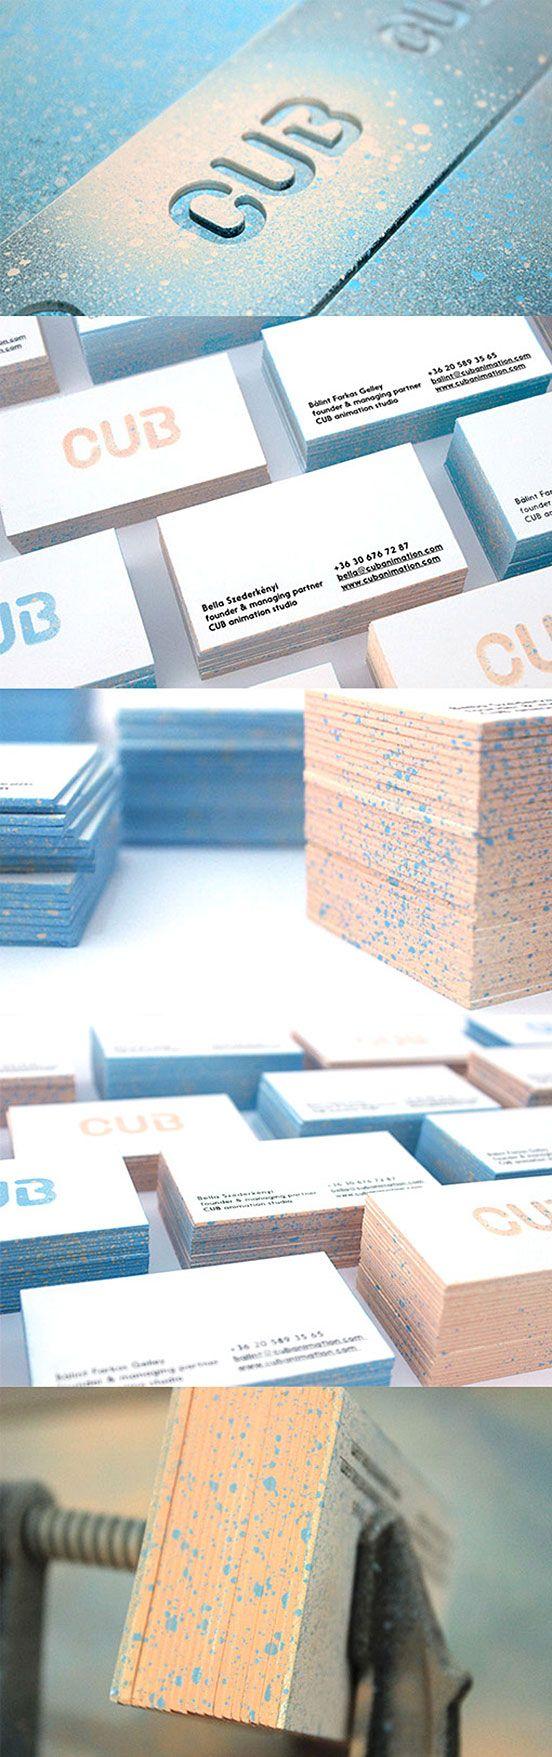 Lasercut Perspex Business Card Edge Painted Business Cards Business Cards Creative Business Card Design